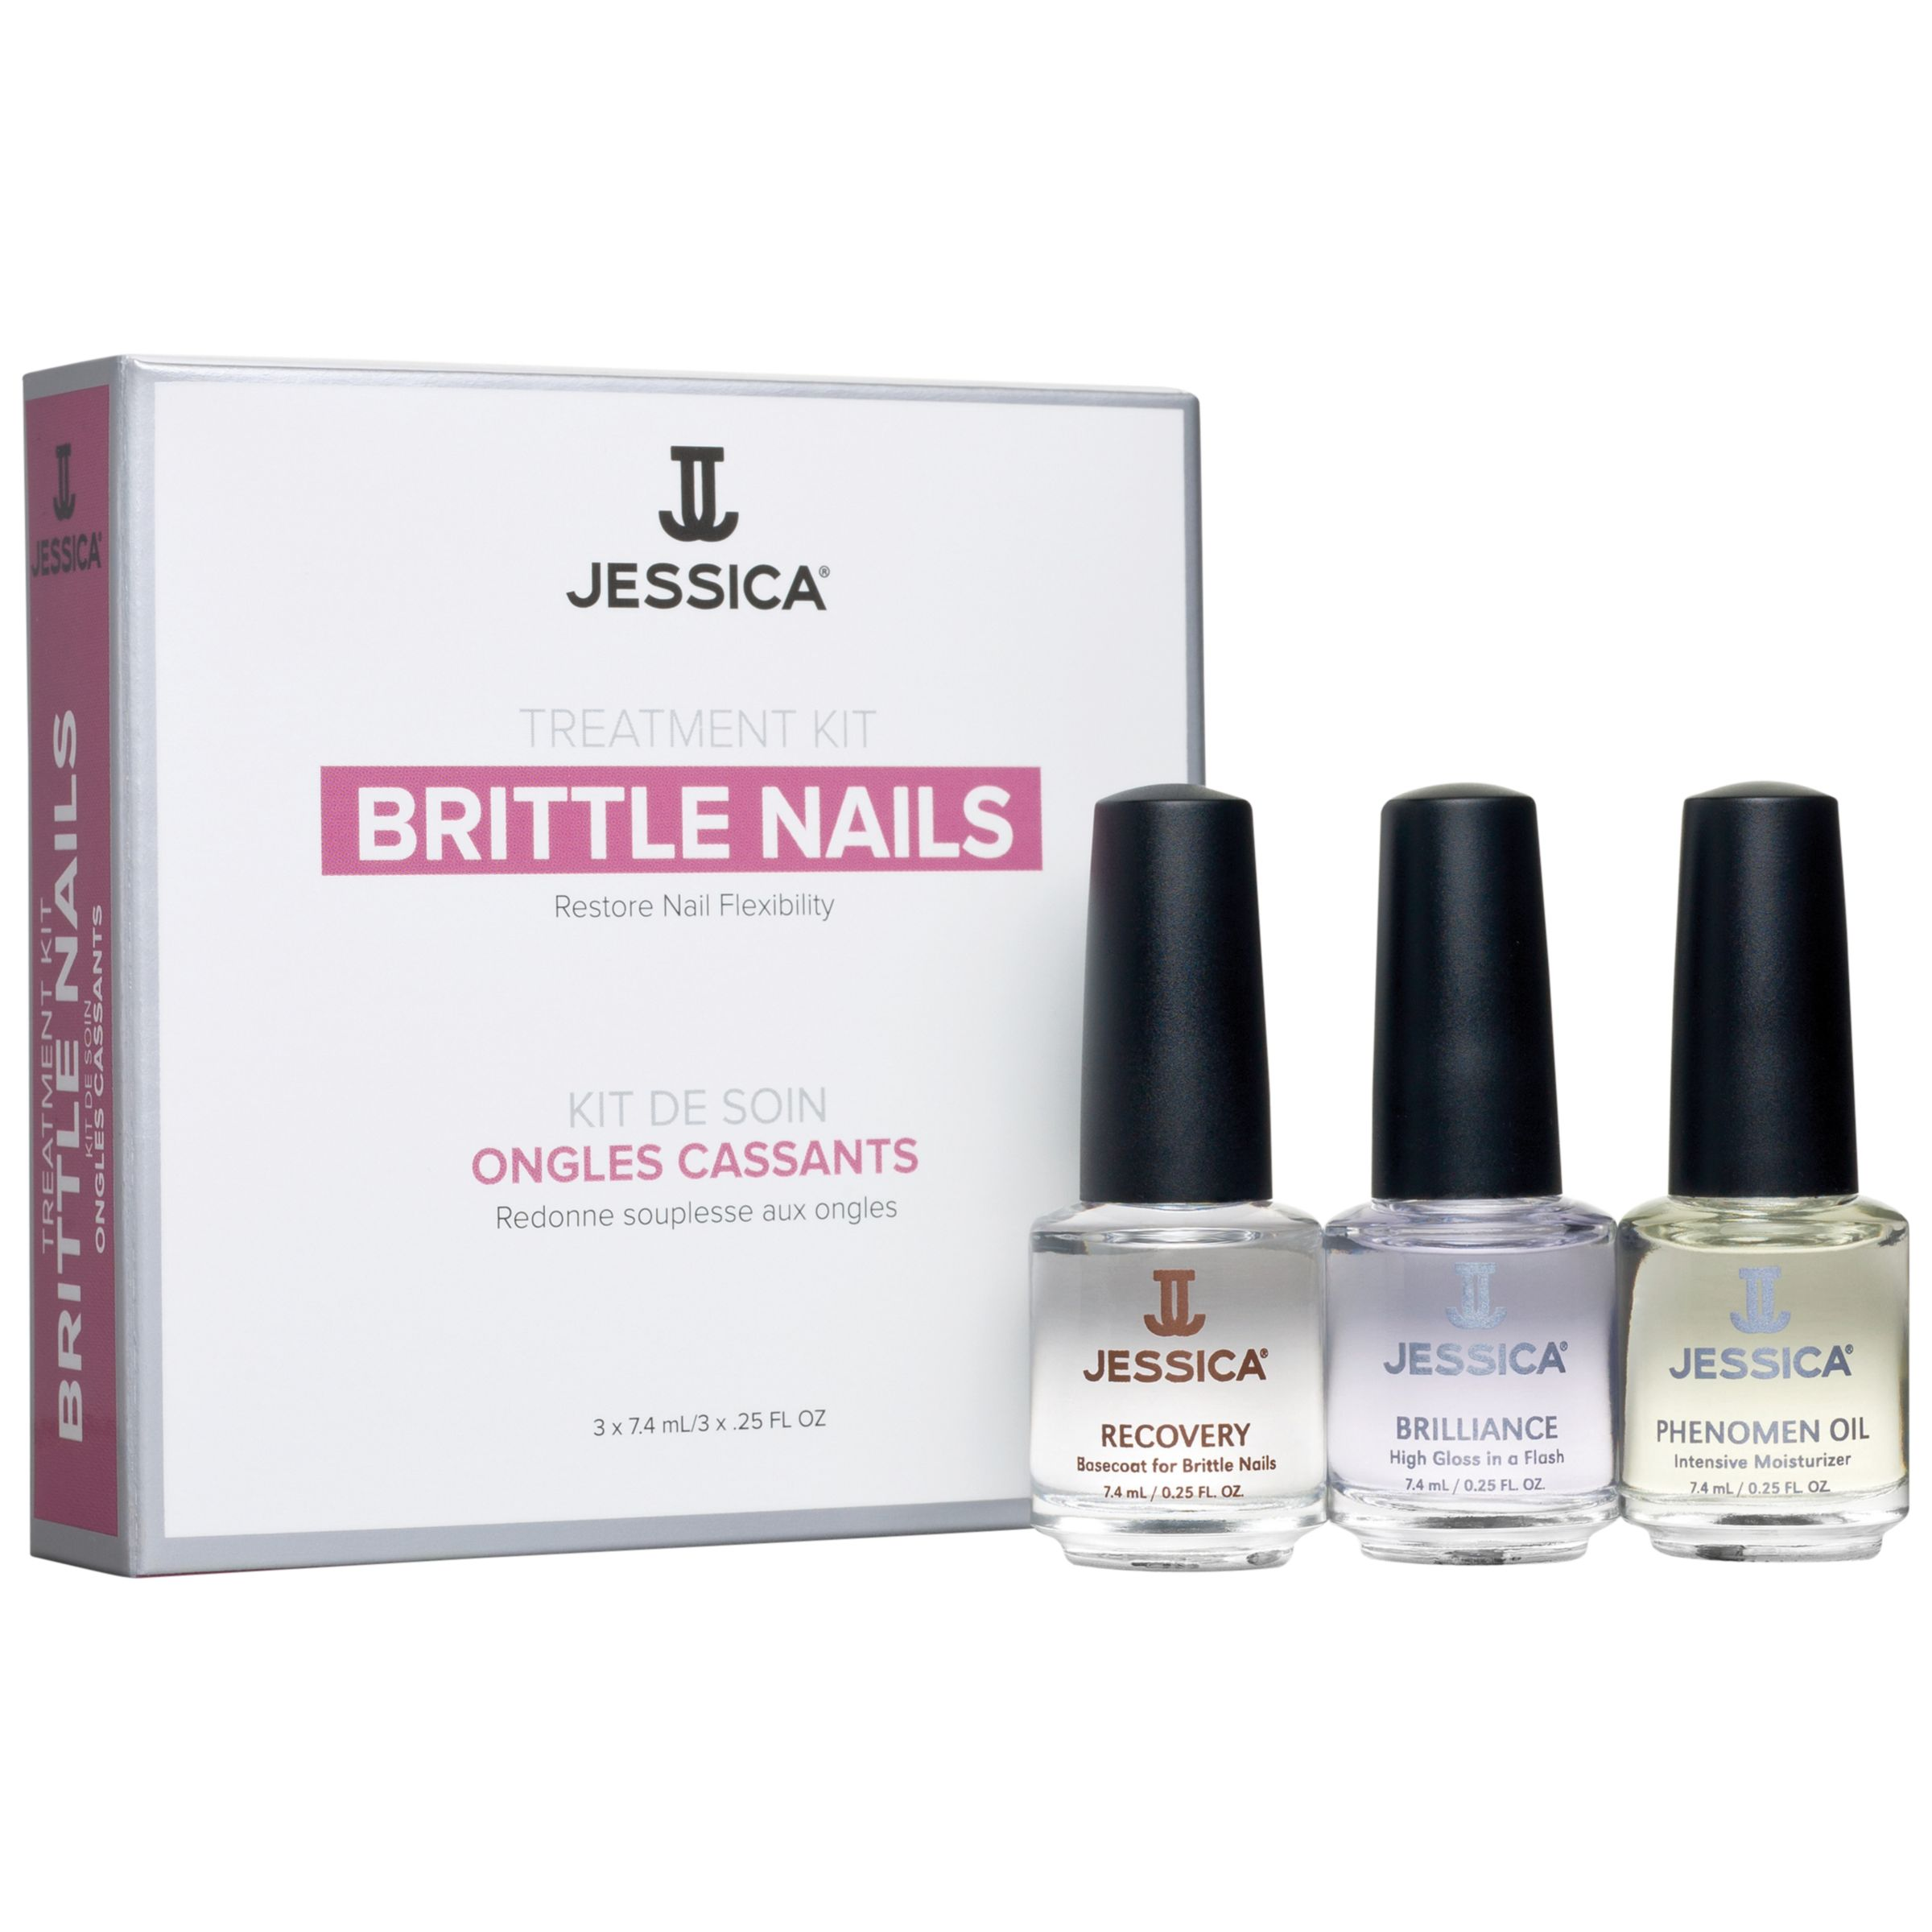 Jessica Jessica Brittle Nails Treatment Kit